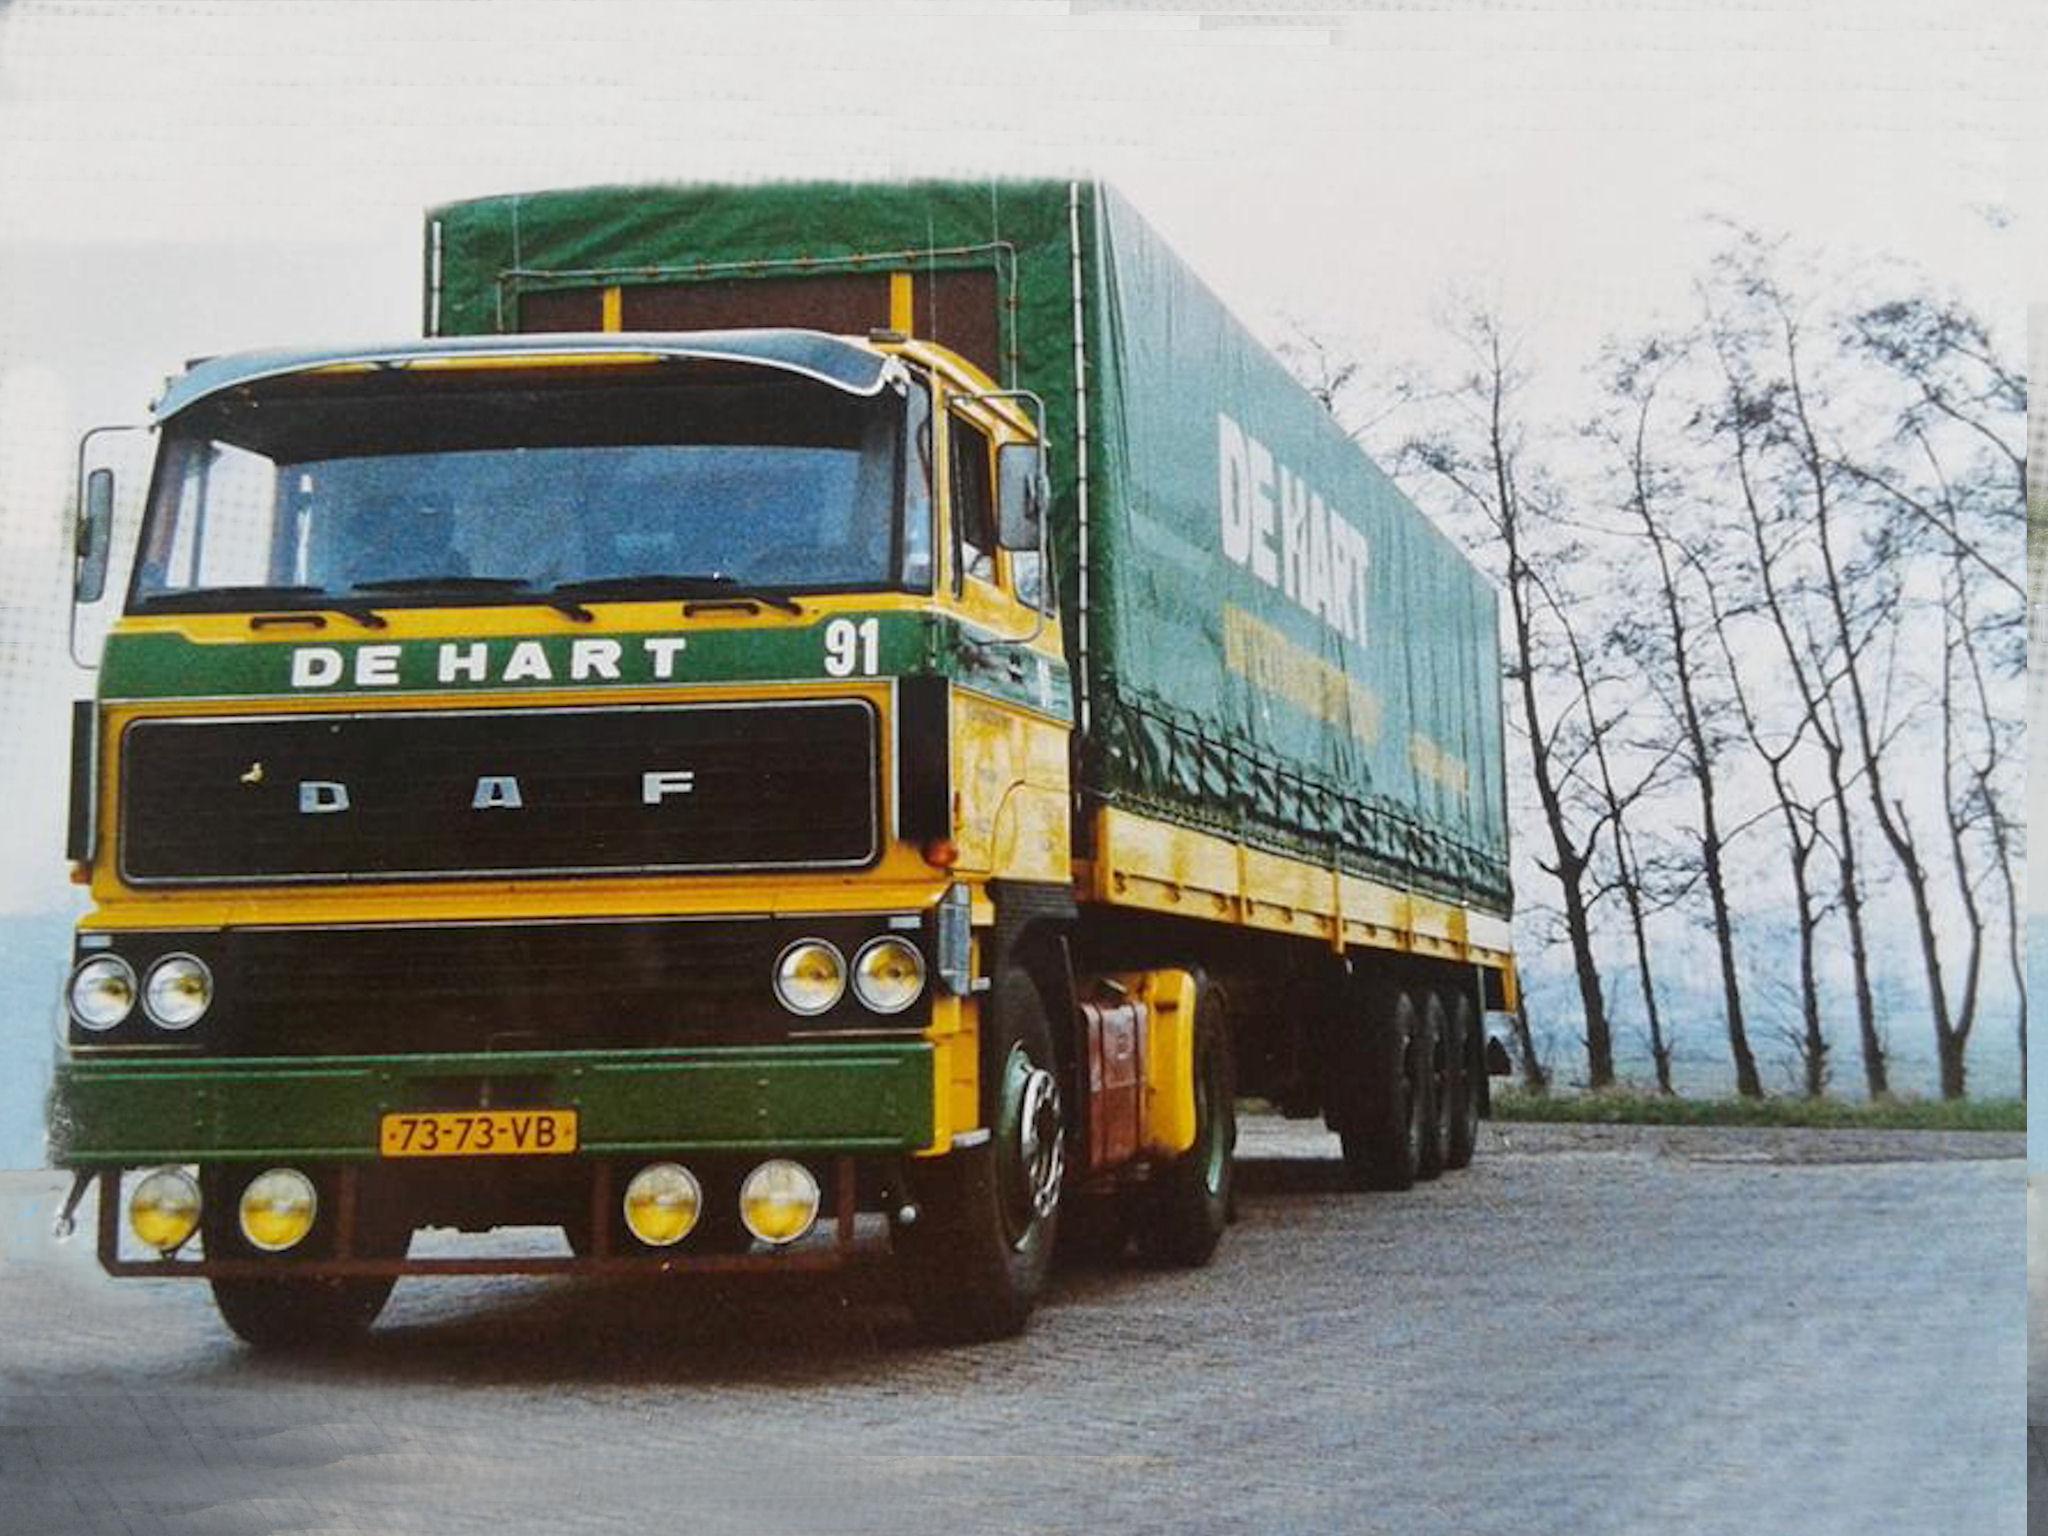 DAF-91--John-van-Andel-archief